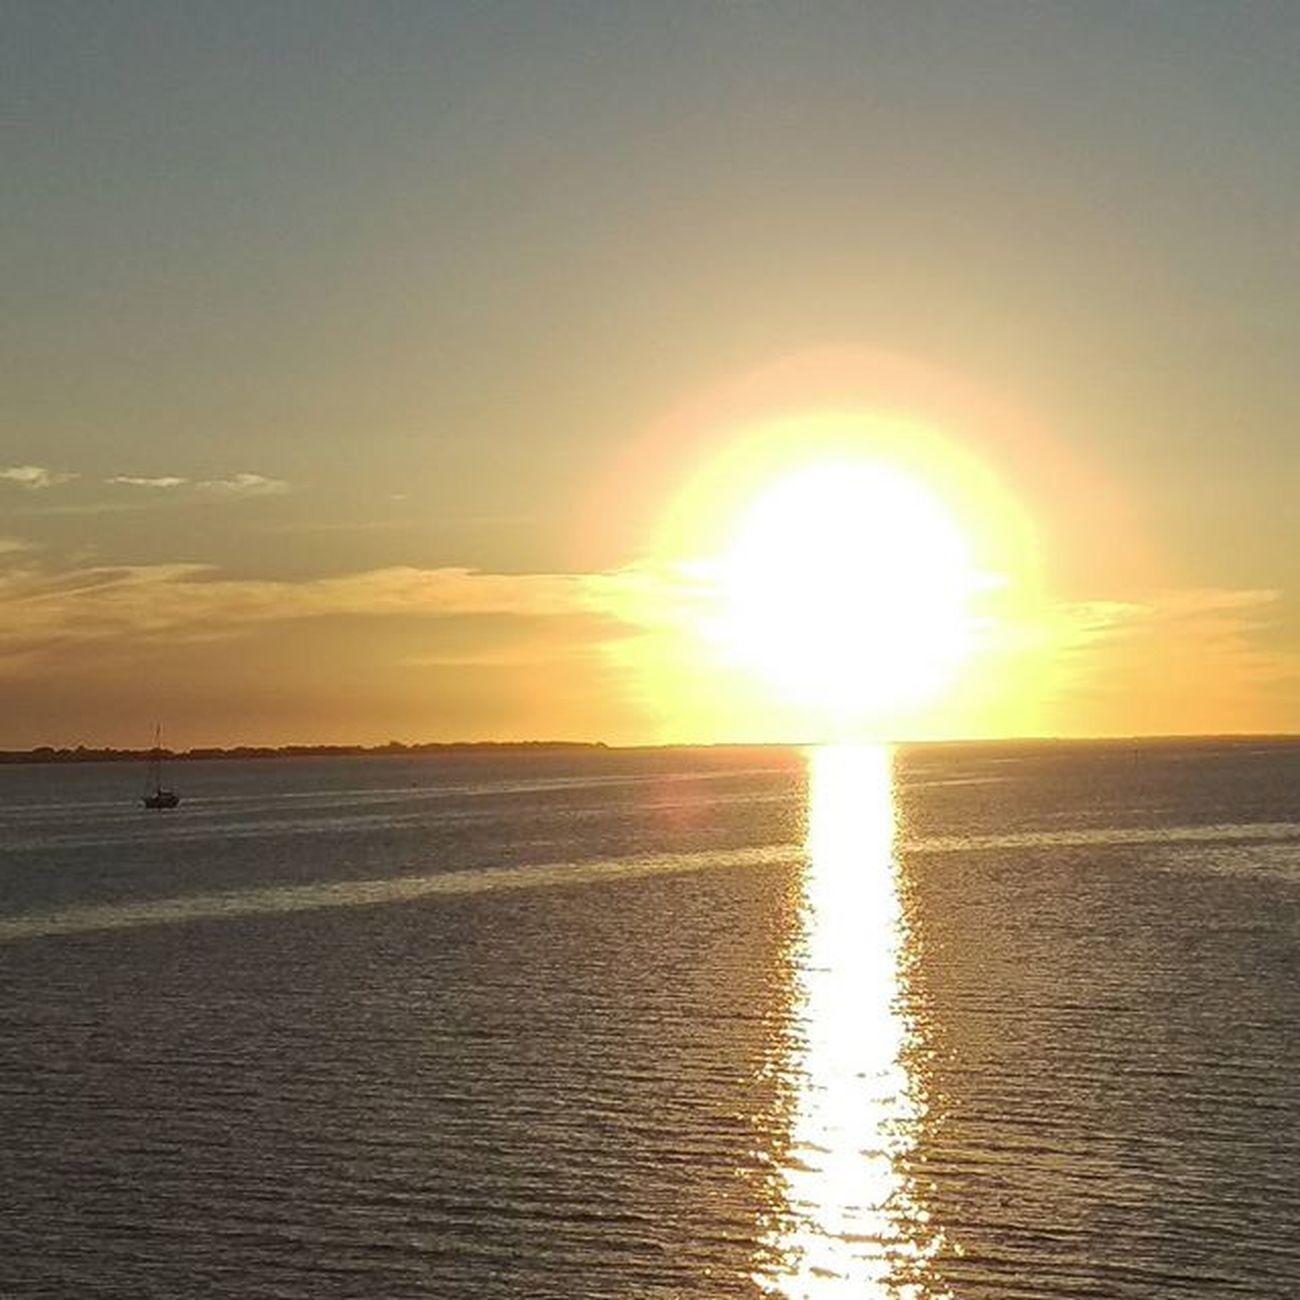 BIG Beautiful Sun on the Horizon Navarrebeach Navarre LoveFl Emeraldcoast Emeraldcoasting Sunset Sailboat HTCOneM9 Htconelife Oneography 20 .7mp @htc @HTCUSA @HTC_UK @HTCelevate @HTCMEA @HTC_IN @HTCIreland @HTCCanada @HTCMalaysia @htcsouthasia @htcfrance TeamHTC @sharealittlesunshine @pureflorida Beachlife